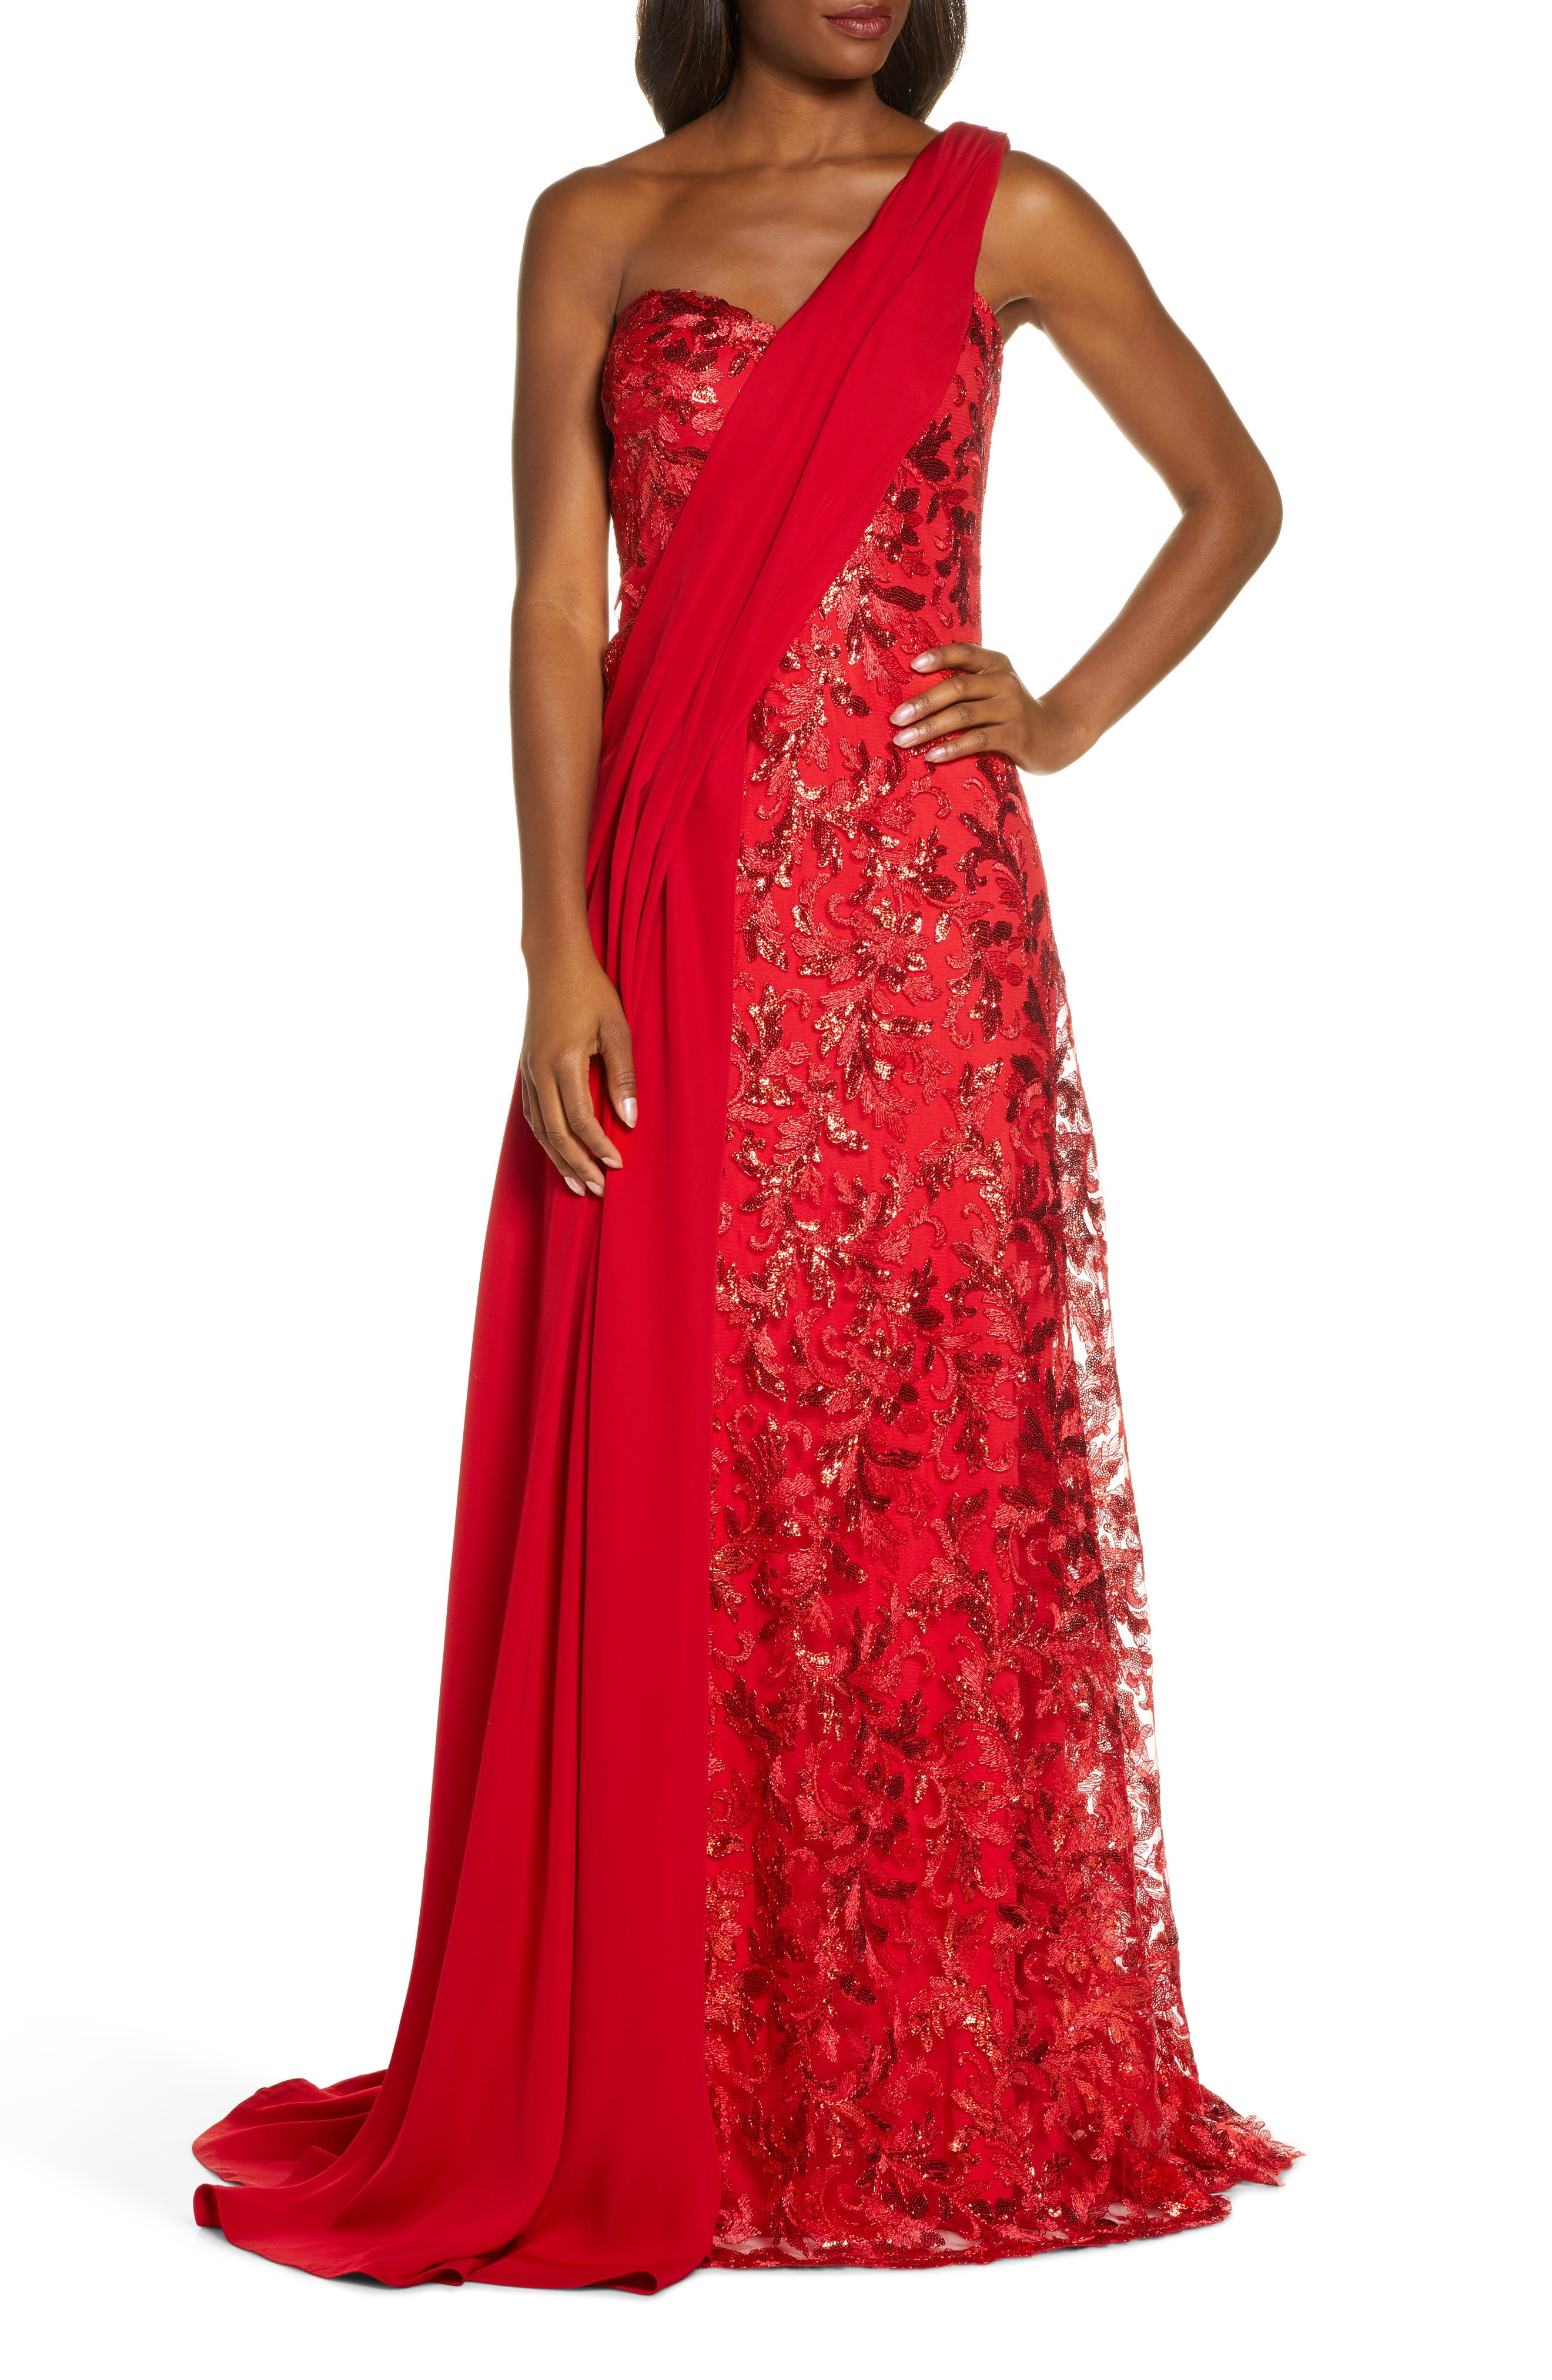 1950s Formal Dresses & Evening Gowns to Buy Womens Tadashi Shoji One-Shoulder Sequin Lace  Crepe Gown $588.00 AT vintagedancer.com